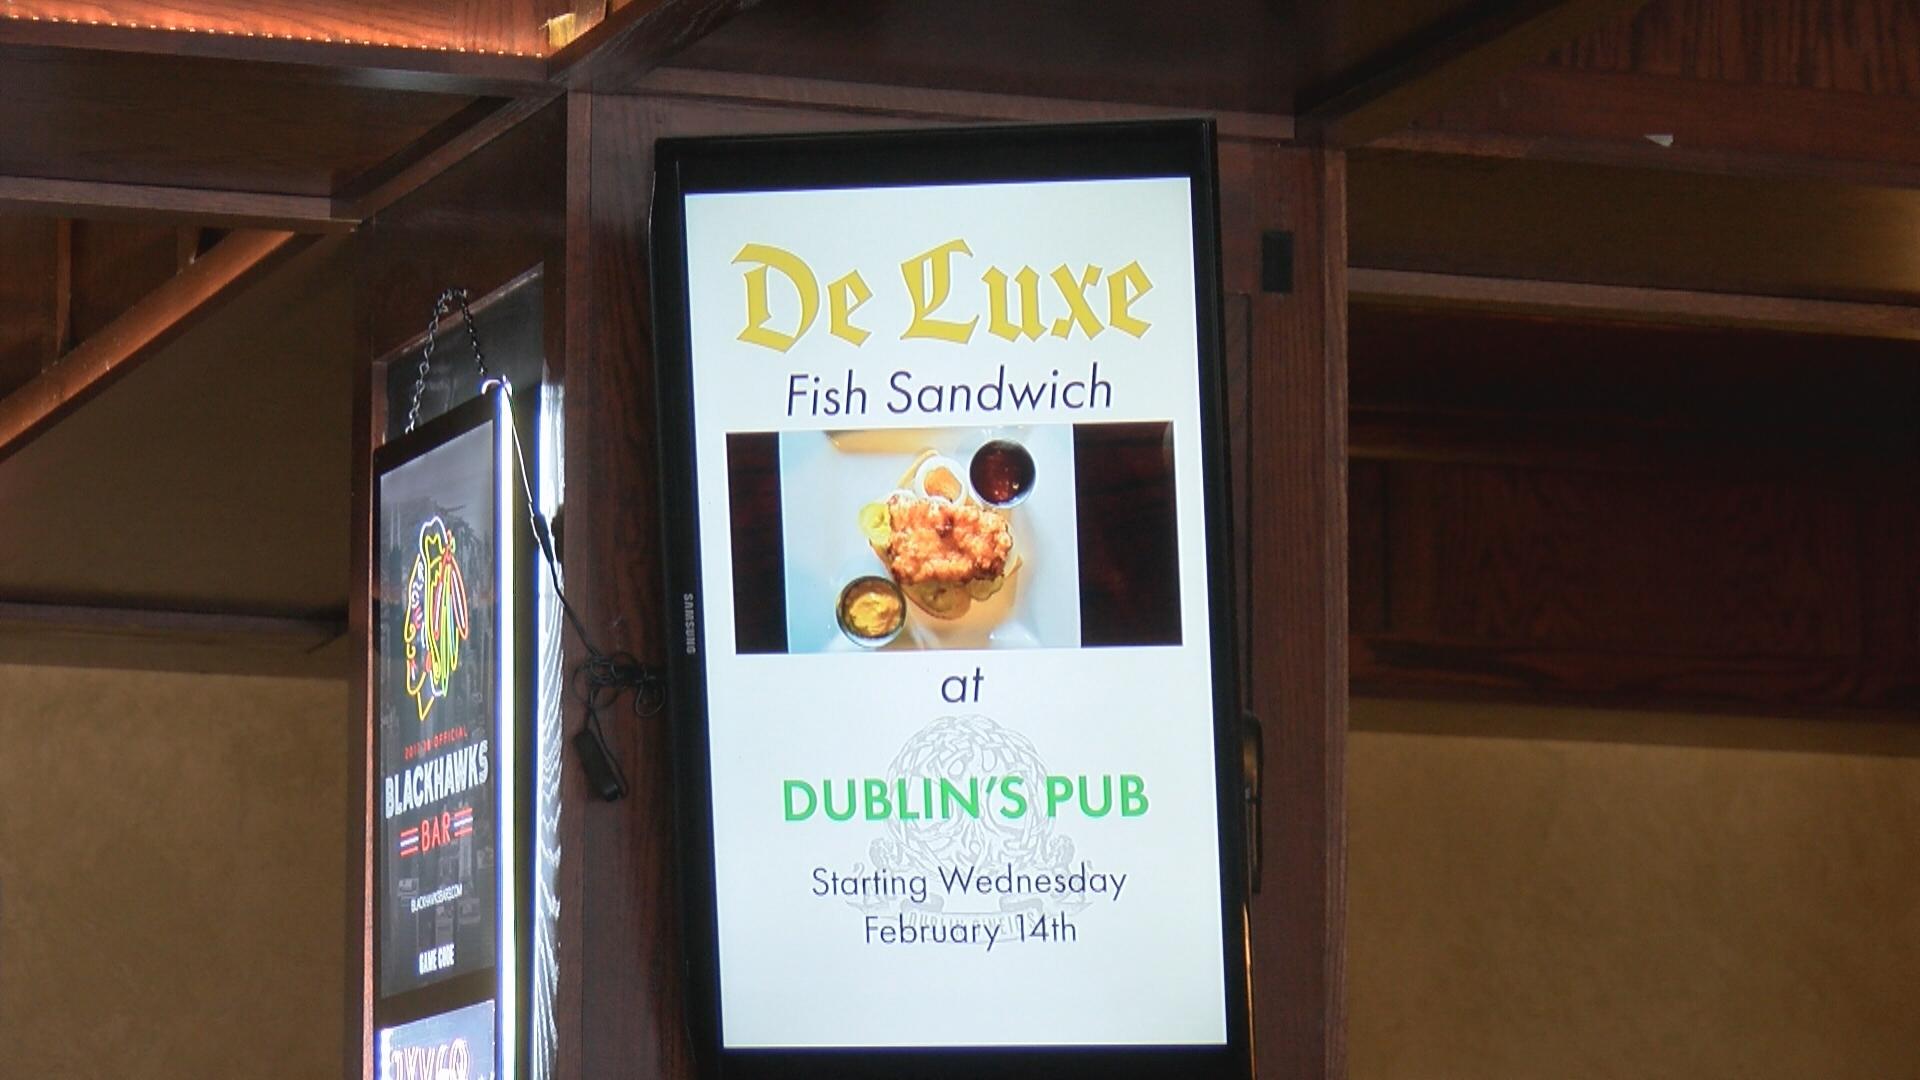 deluxe fish sandwich dublins pub_1518474141530.jpg.jpg